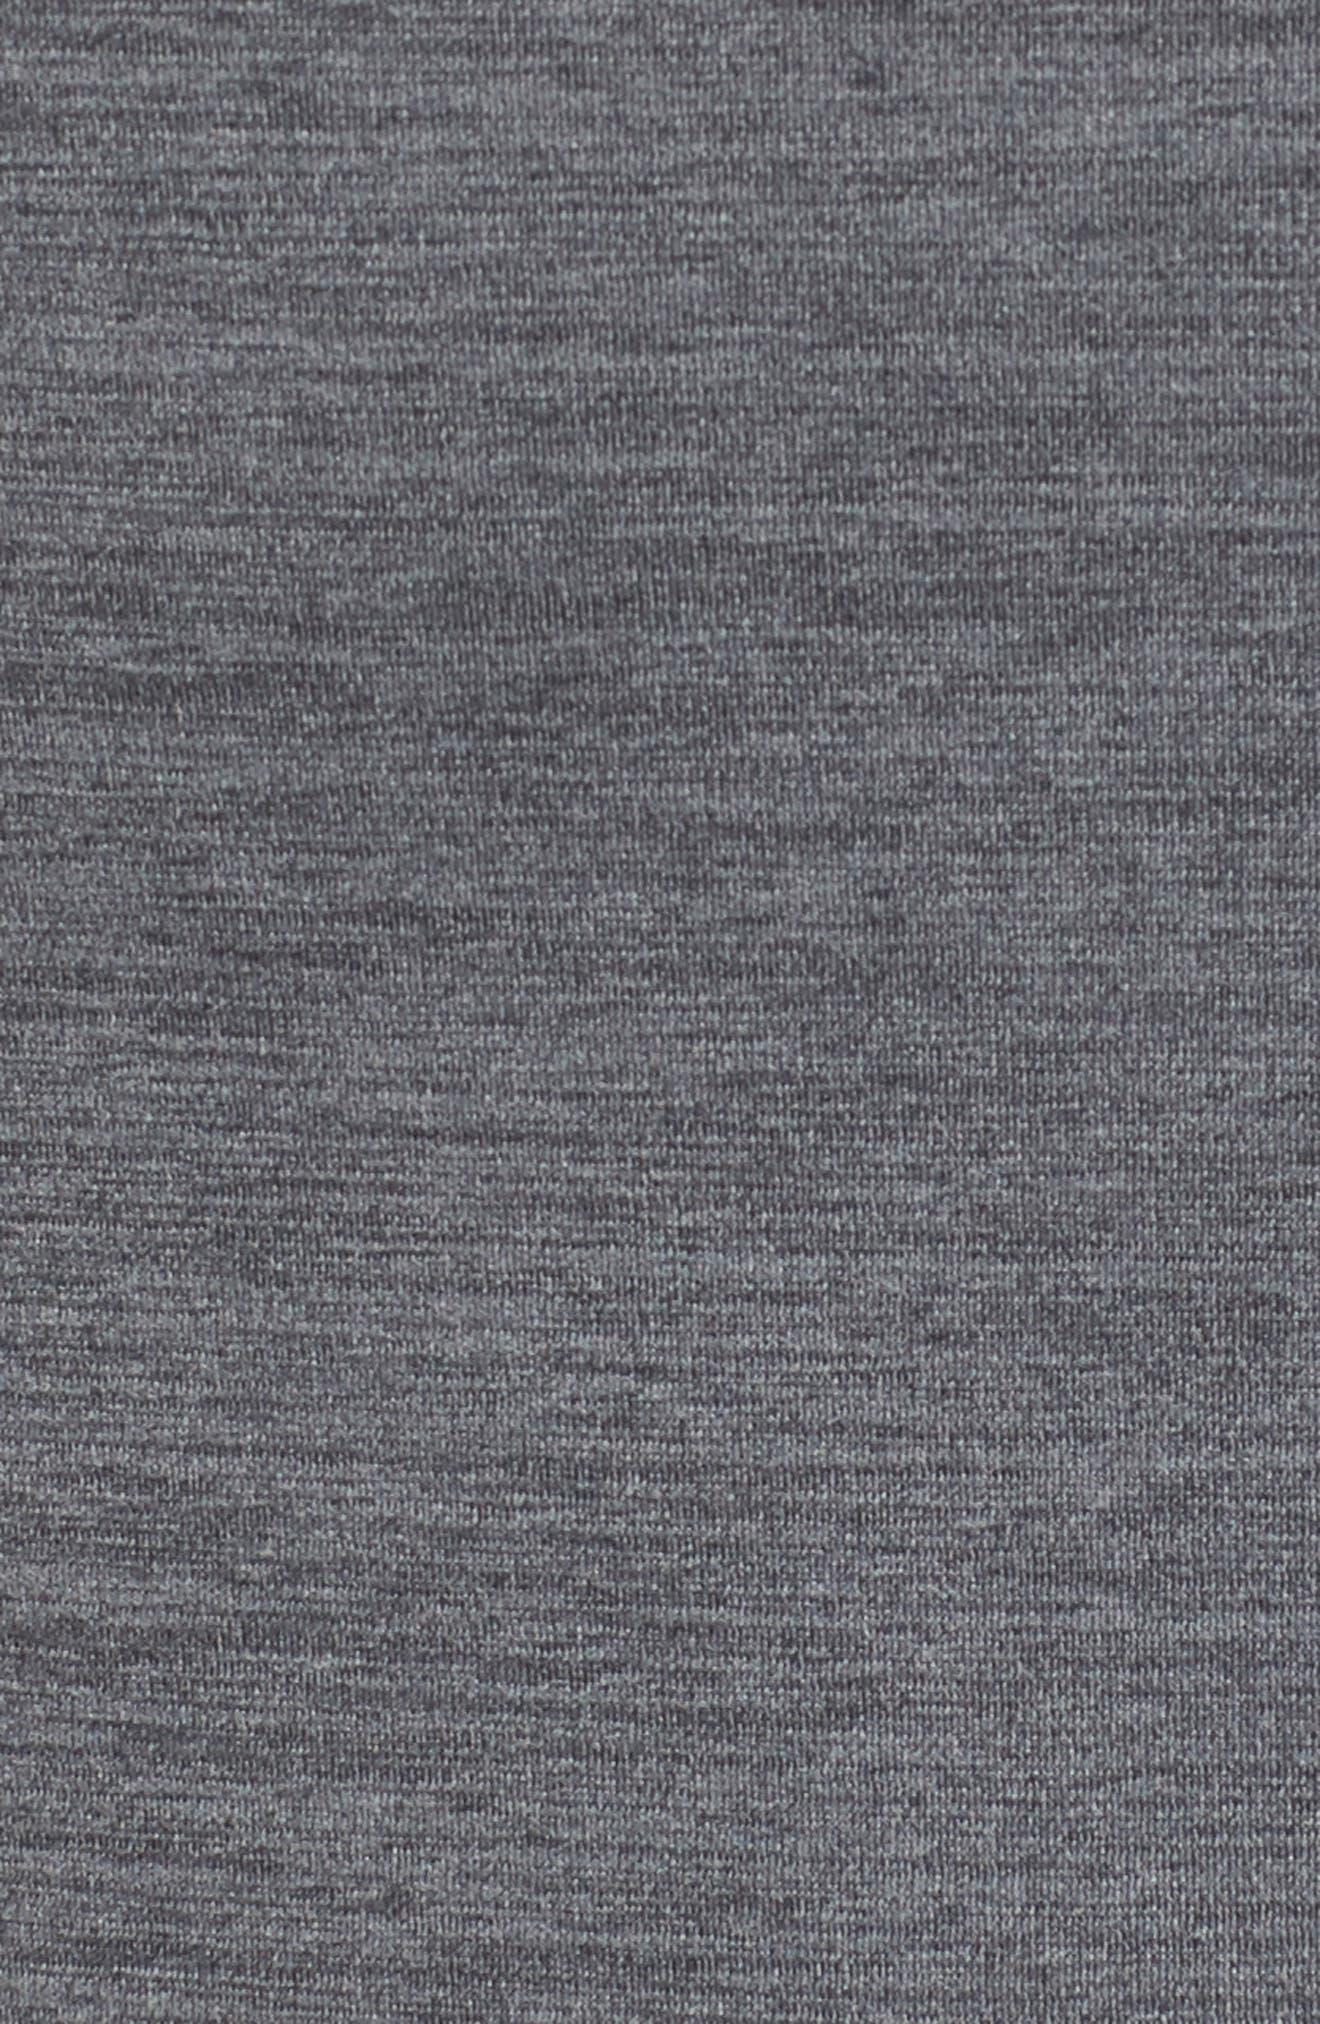 R18 Tech F1 Quarter Zip Pullover,                             Alternate thumbnail 5, color,                             011